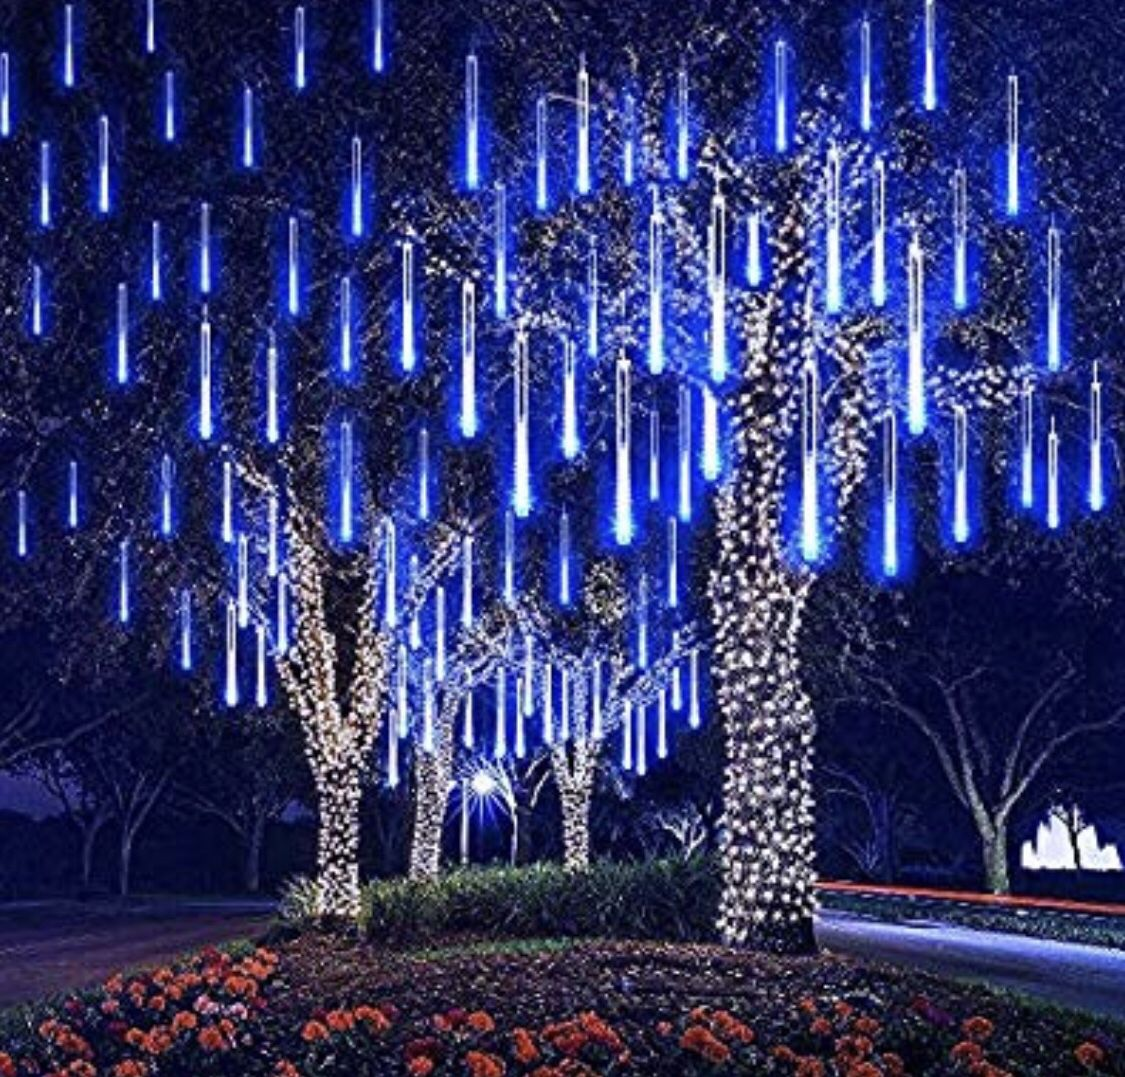 LED Shower Rain Lights Drop//Icicle Snow Falling Raindrop Waterproof Cascading